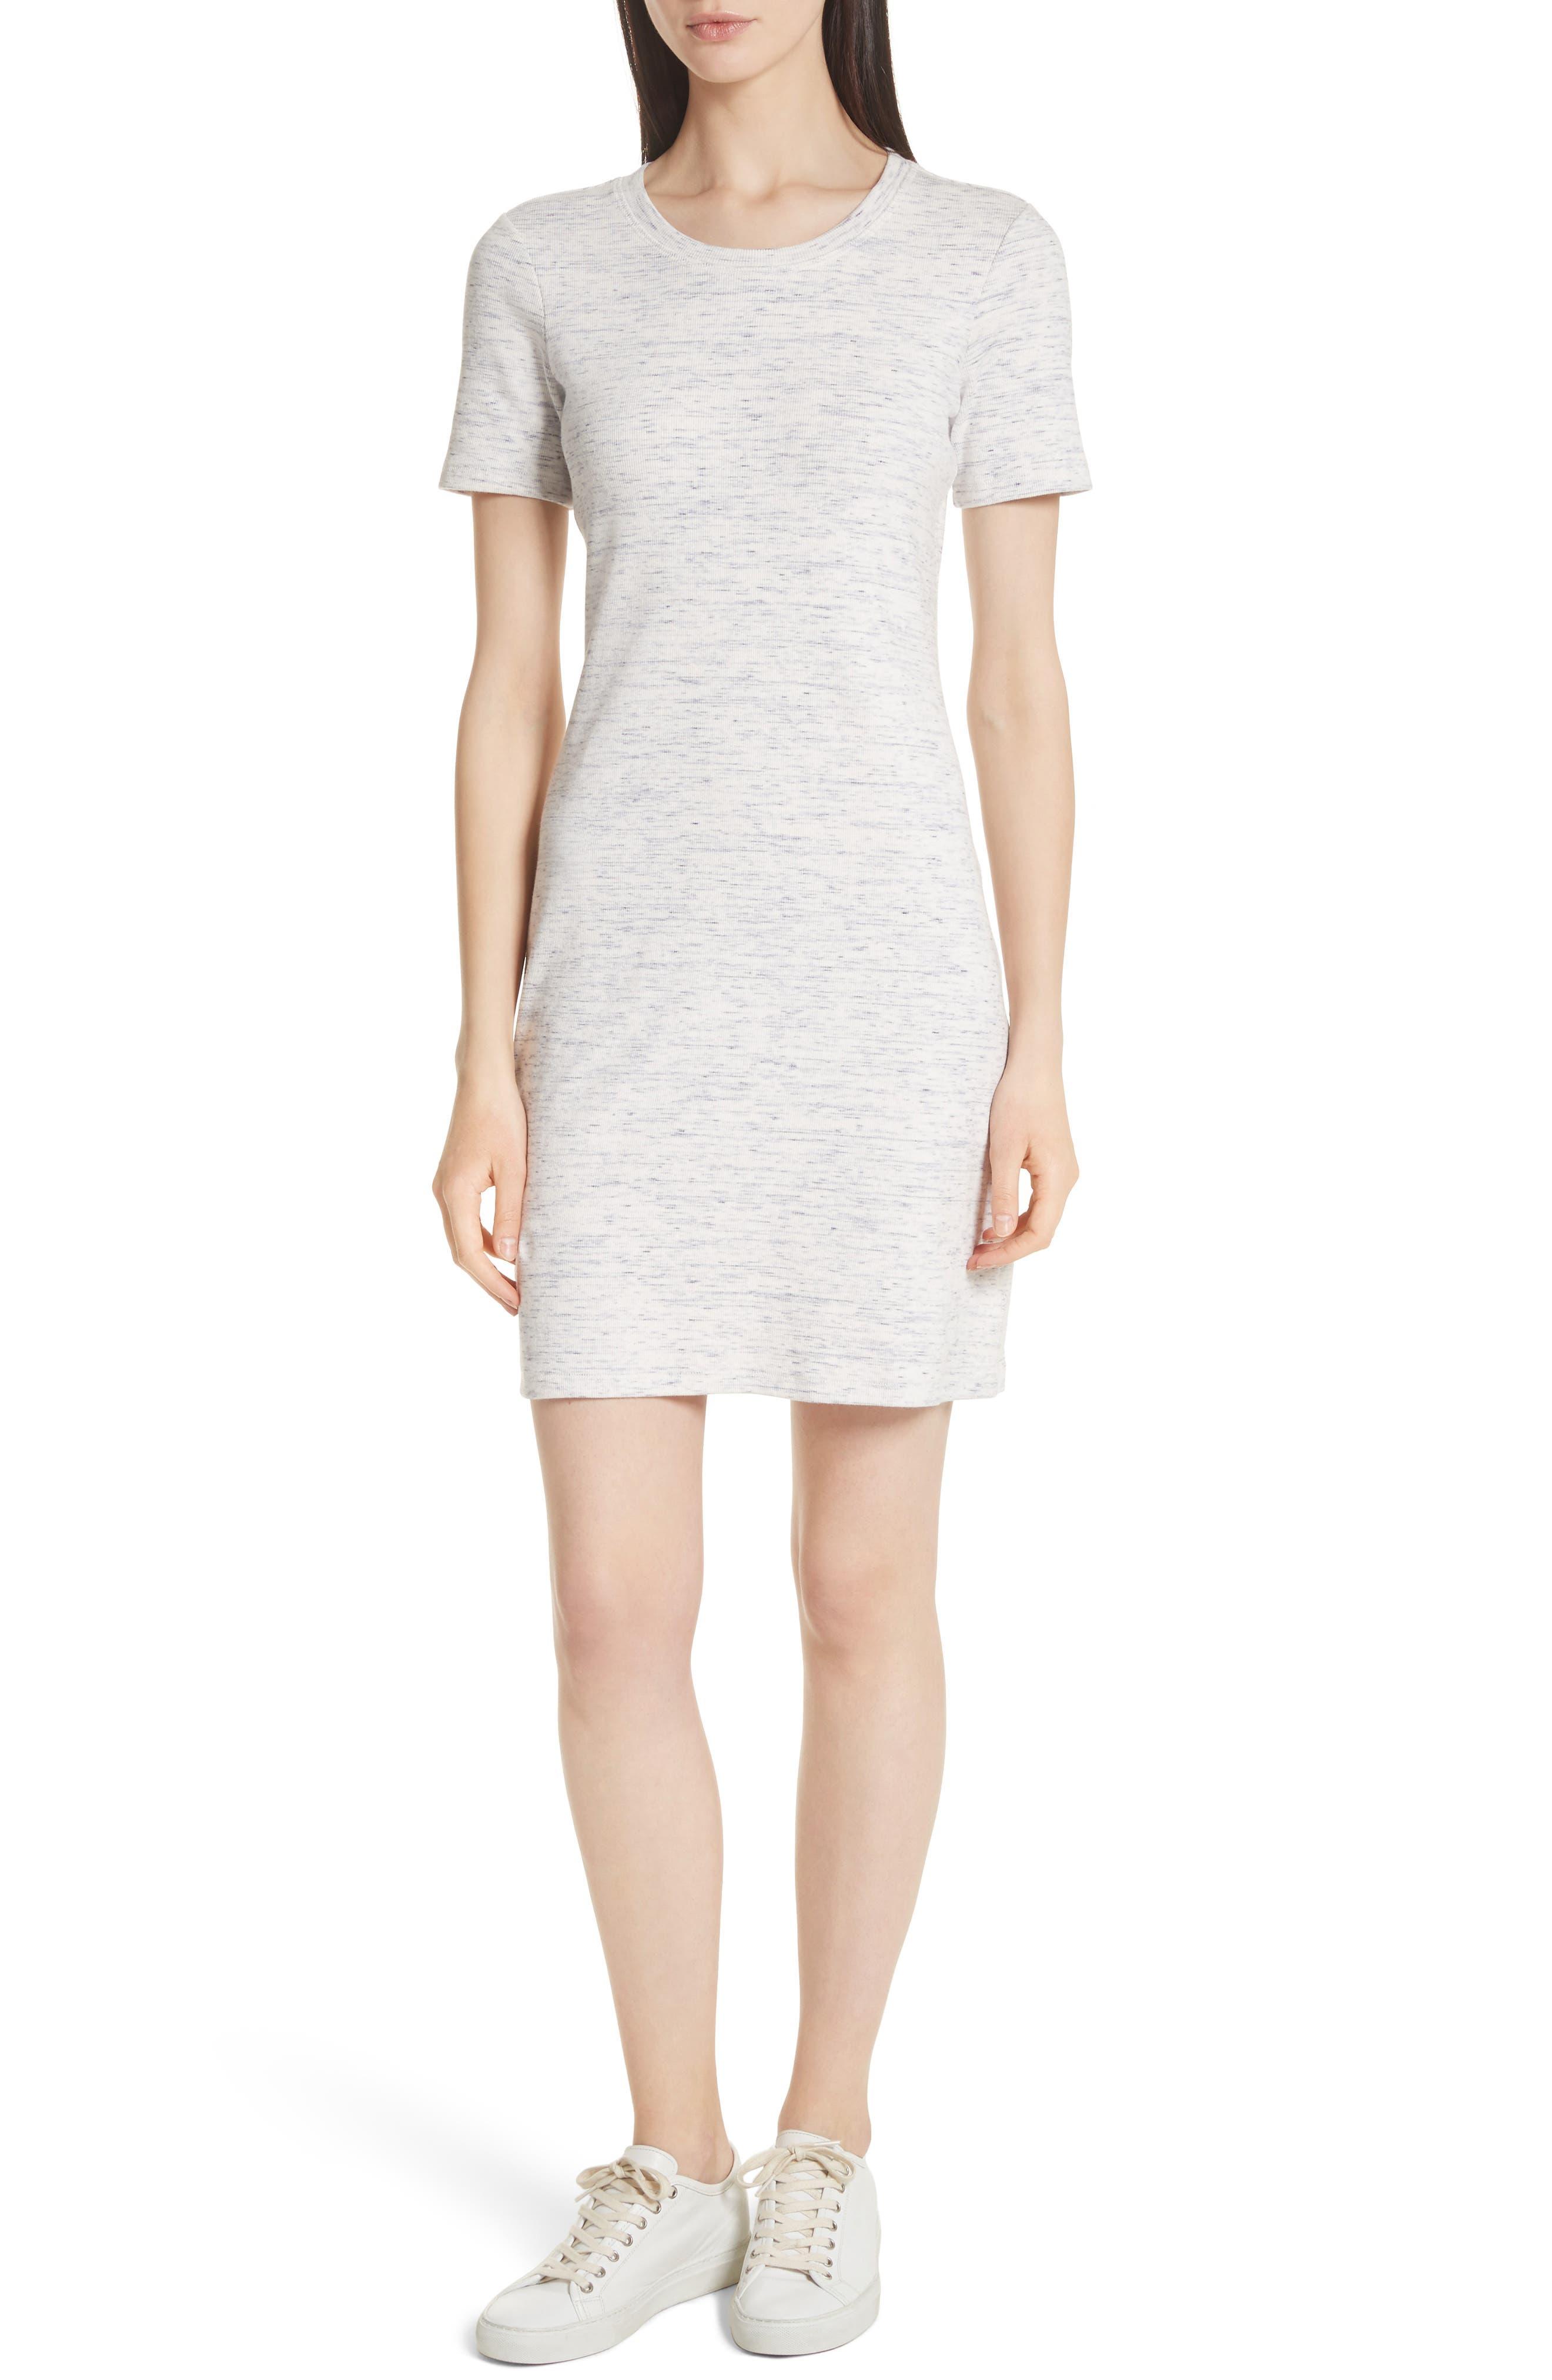 Cherry B3. T-Shirt Dress,                             Main thumbnail 1, color,                             Light Denim Melange